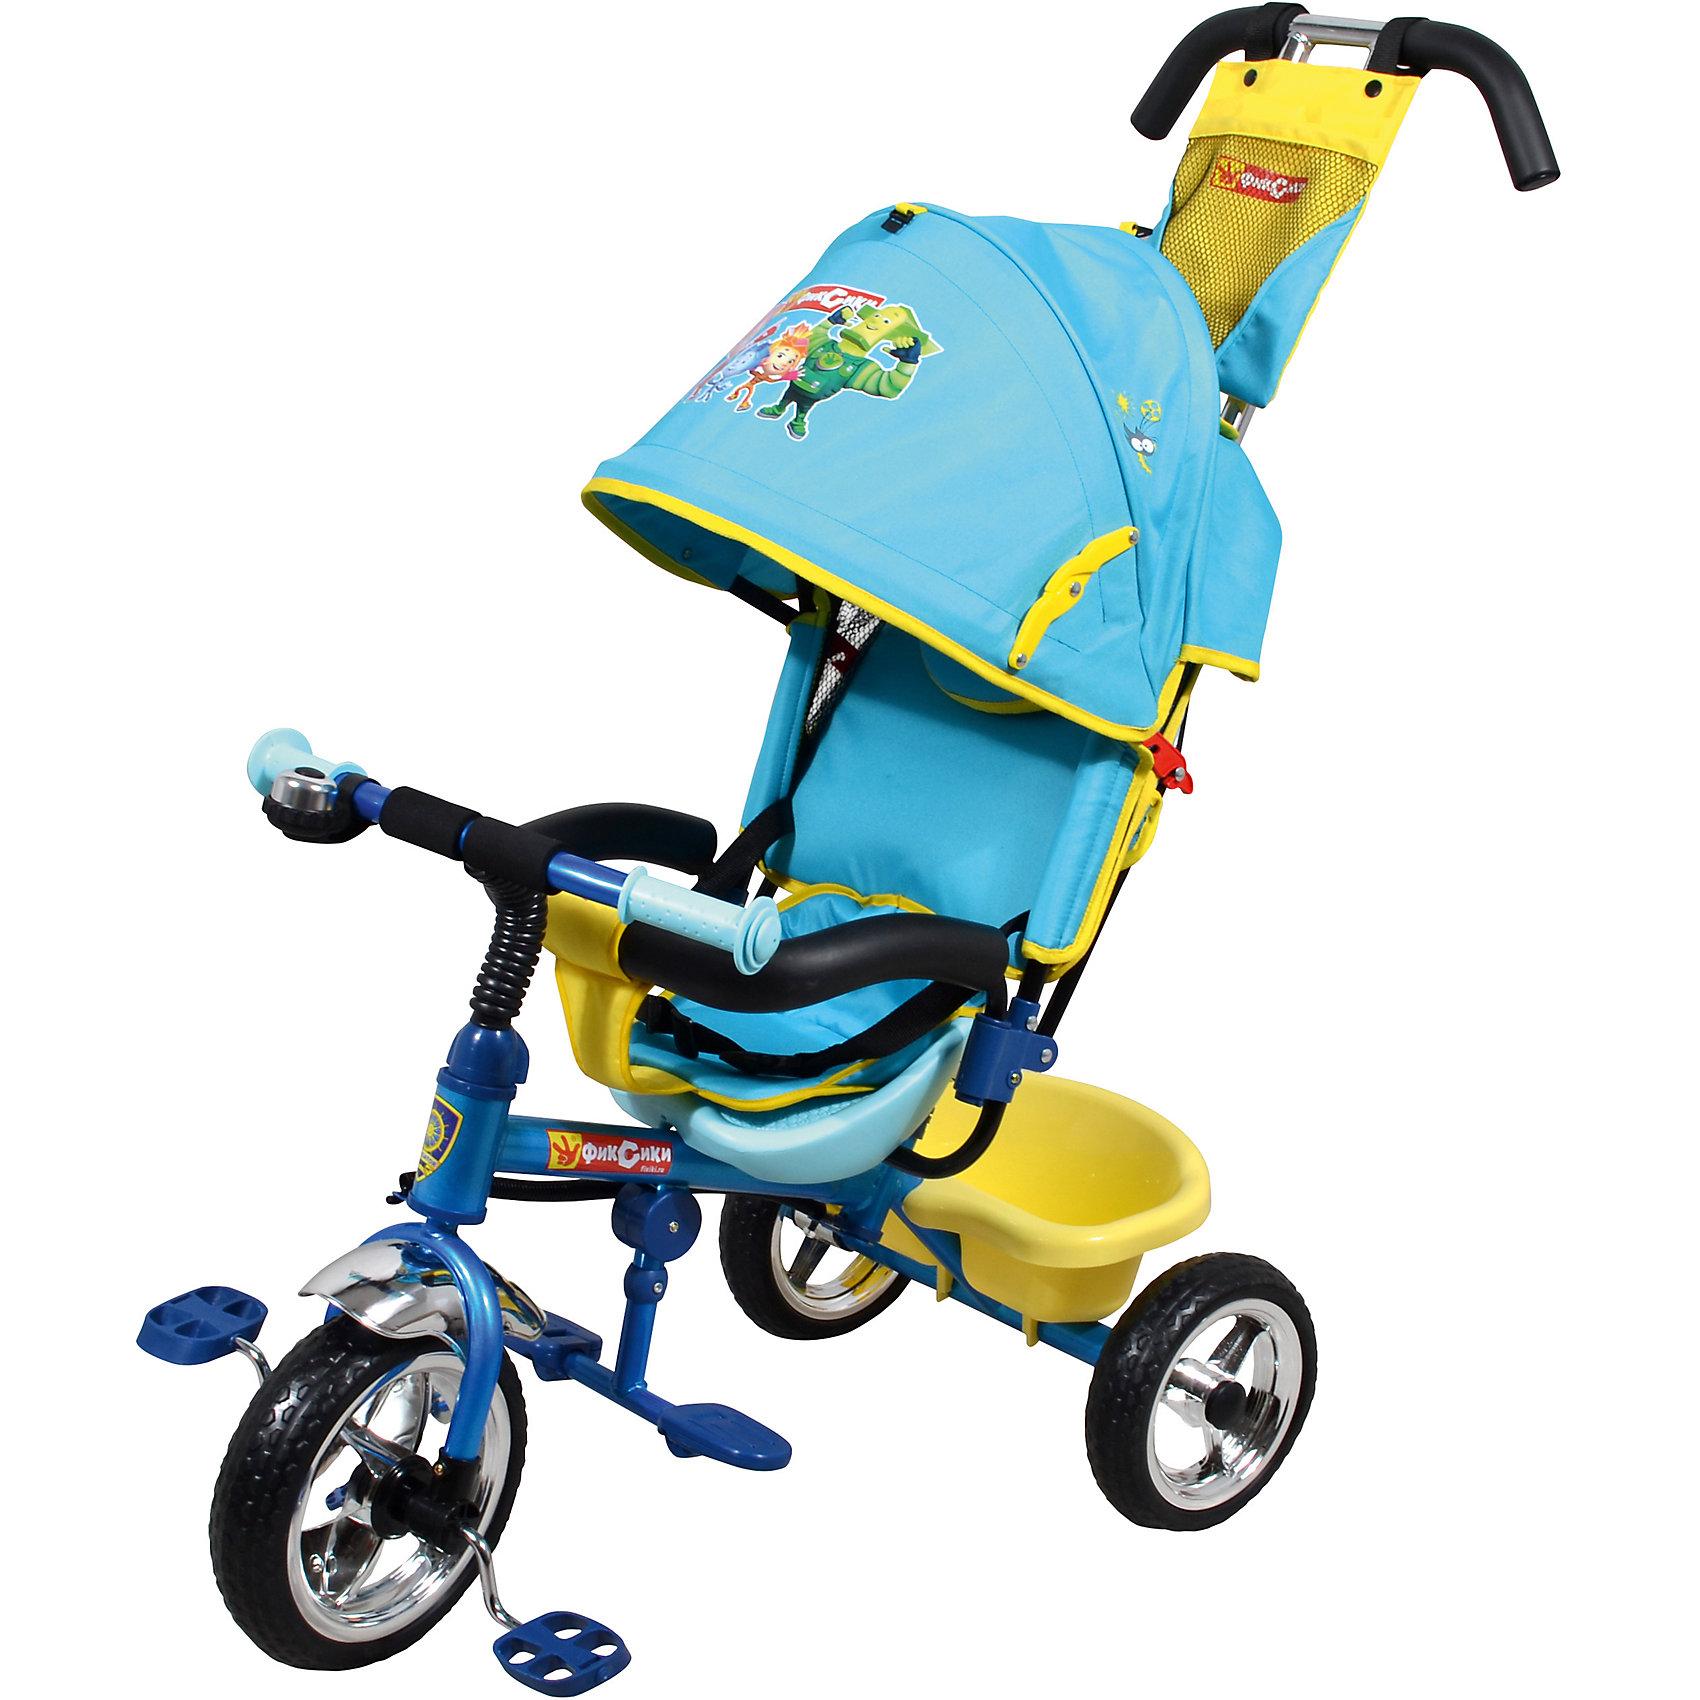 Lexus Trike Трехколесный велосипед Navigator, Фиксики, Lexus велосипед для малыша navigator lexus safari trike т56790